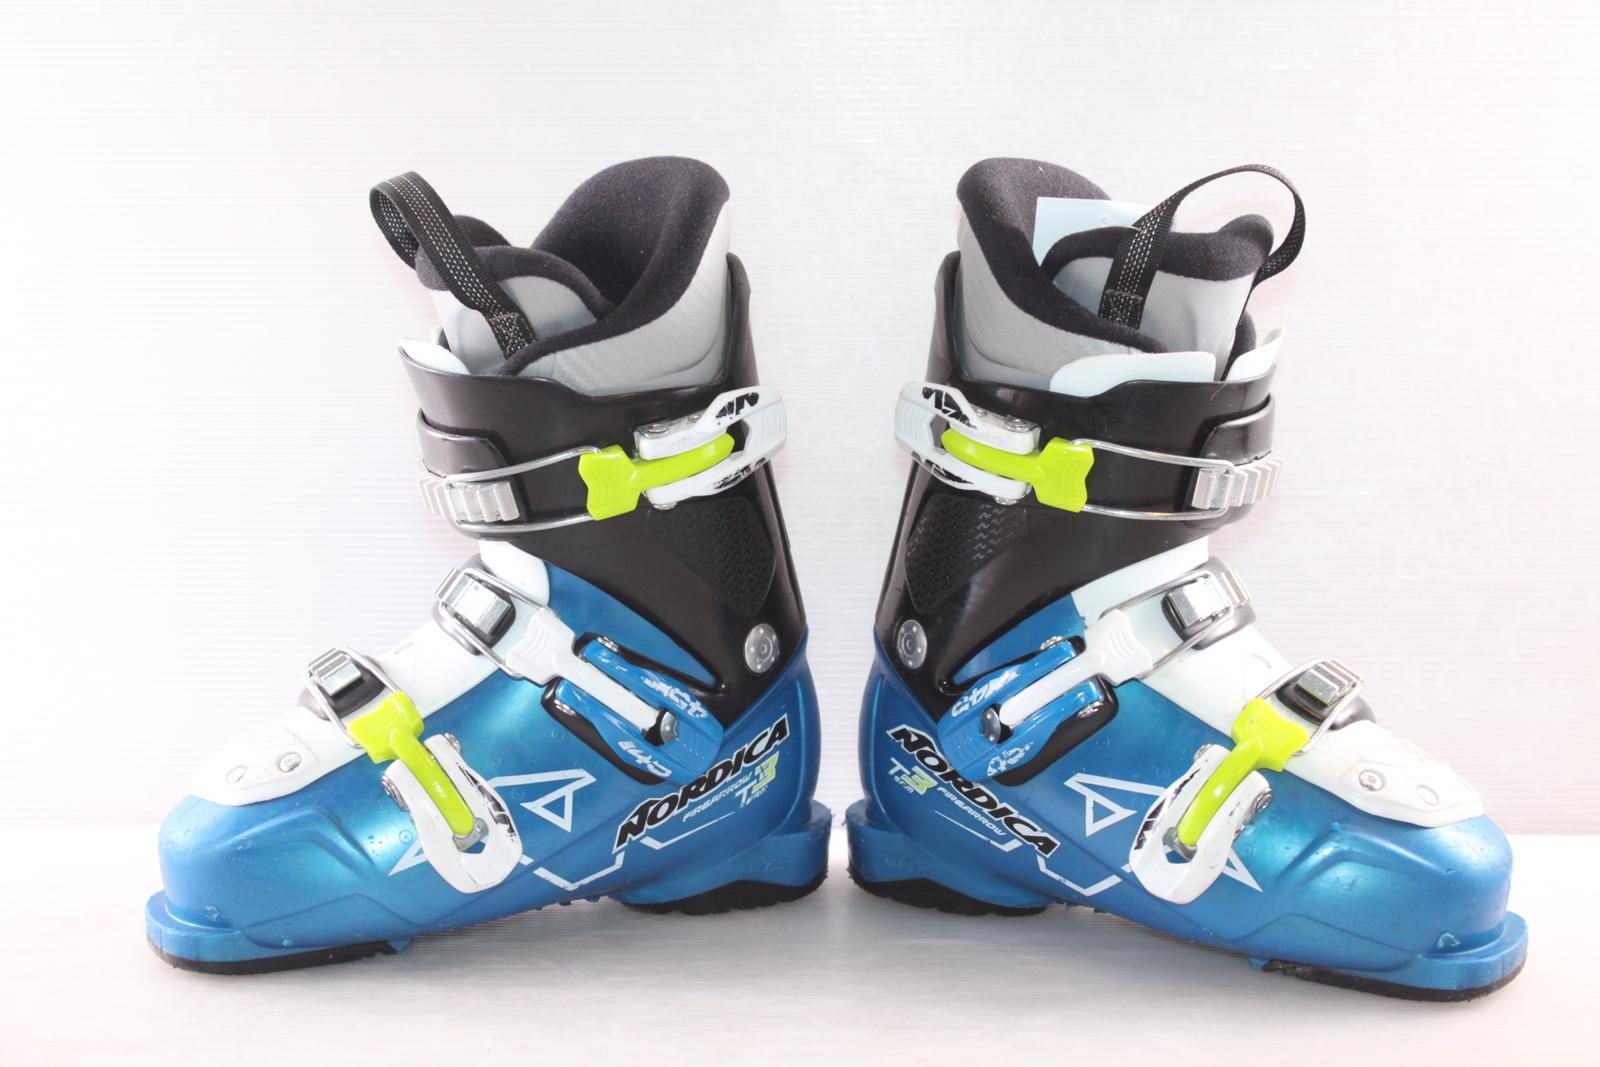 Dětské lyžáky Nordica Team 3 Firearrow vel. EU31